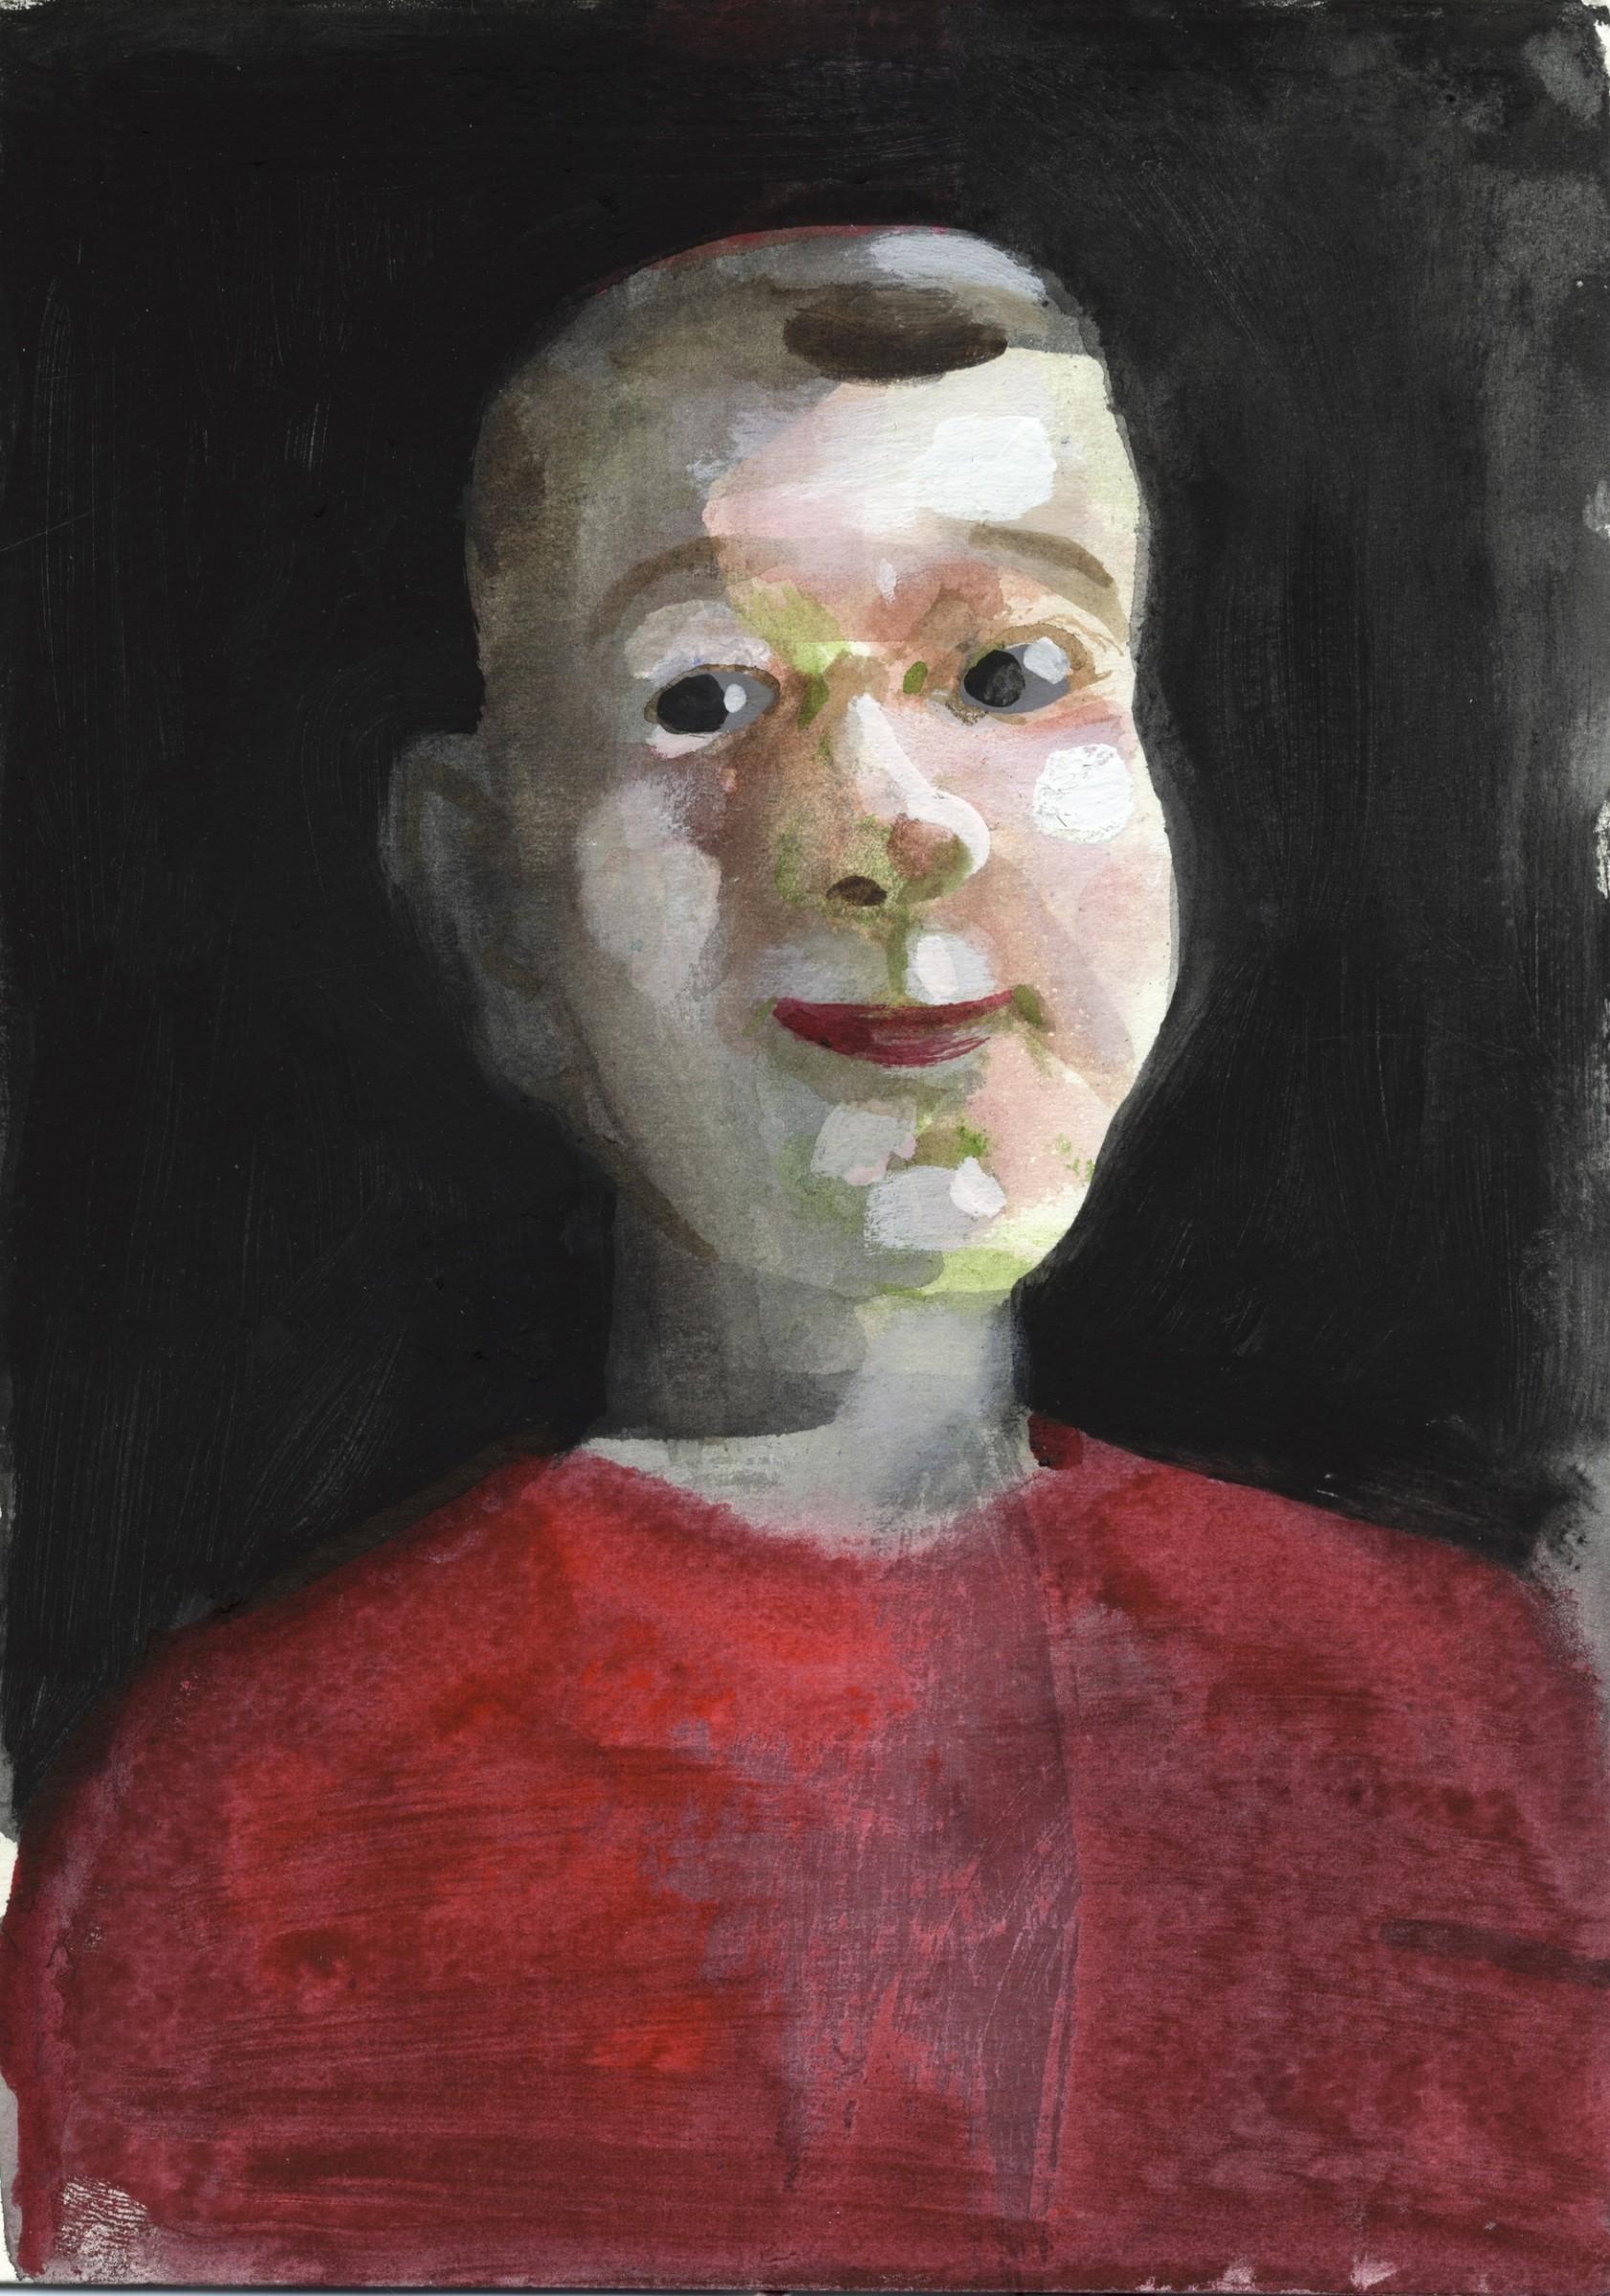 <span class=&#34;link fancybox-details-link&#34;><a href=&#34;/exhibitions/24/works/artworks_standalone10819/&#34;>View Detail Page</a></span><div class=&#34;artist&#34;><span class=&#34;artist&#34;><strong>Charles Williams</strong></span></div><div class=&#34;title&#34;><em>Teenage Pinocchio</em></div><div class=&#34;medium&#34;>watercolour & gouache</div><div class=&#34;dimensions&#34;>36x27cm</div>